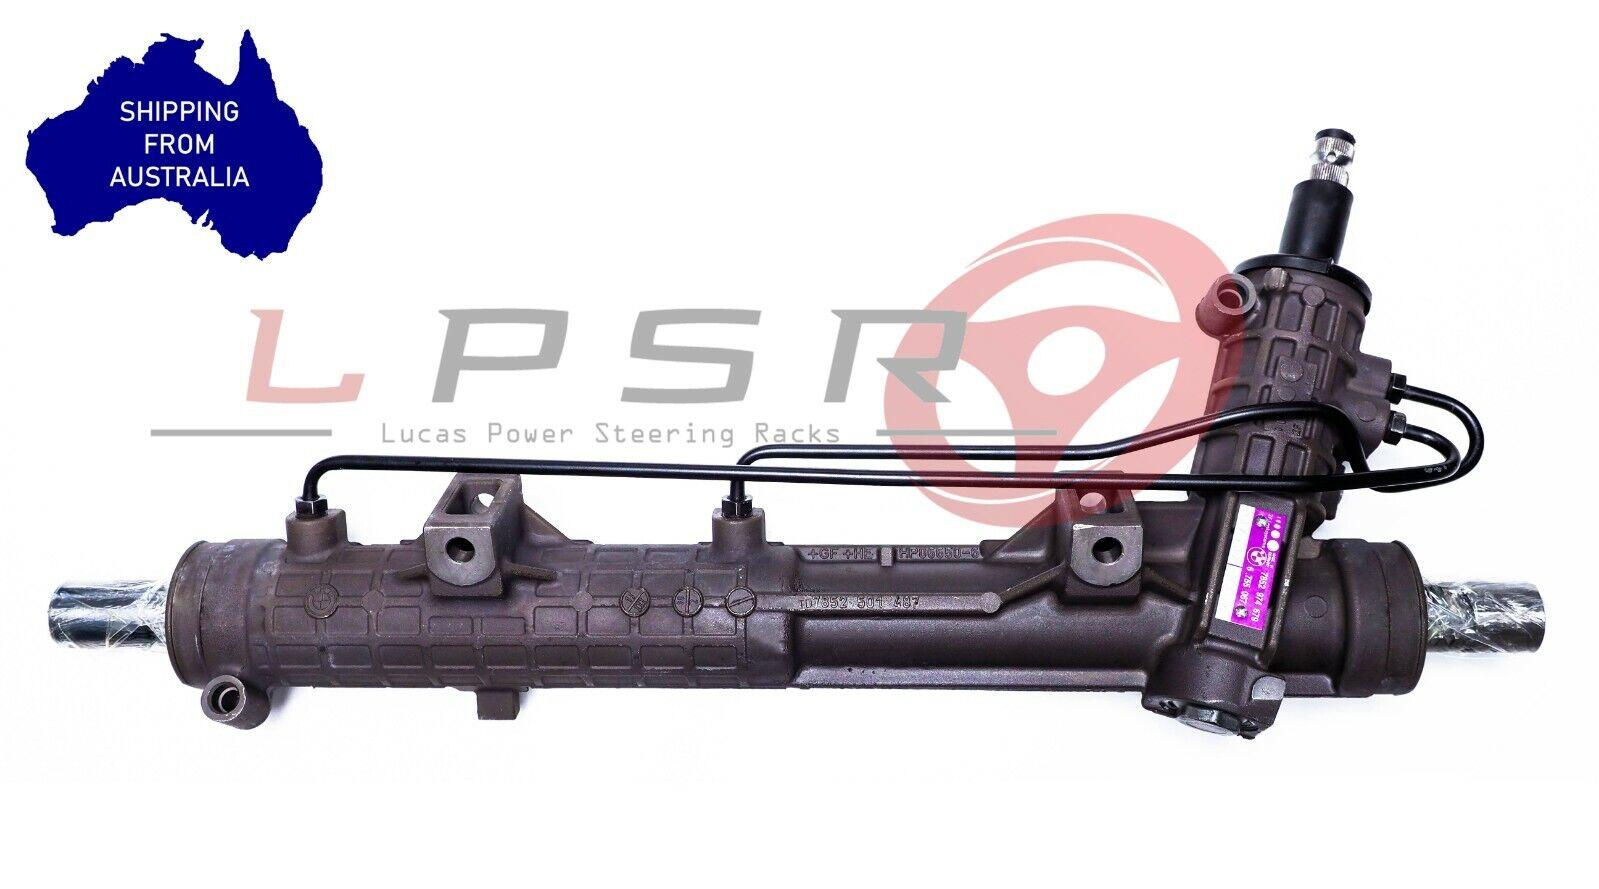 Remanufactured Bmw E46 Power Steering Rack Purple Tag Rhd Suit E30 Conversion Ebay